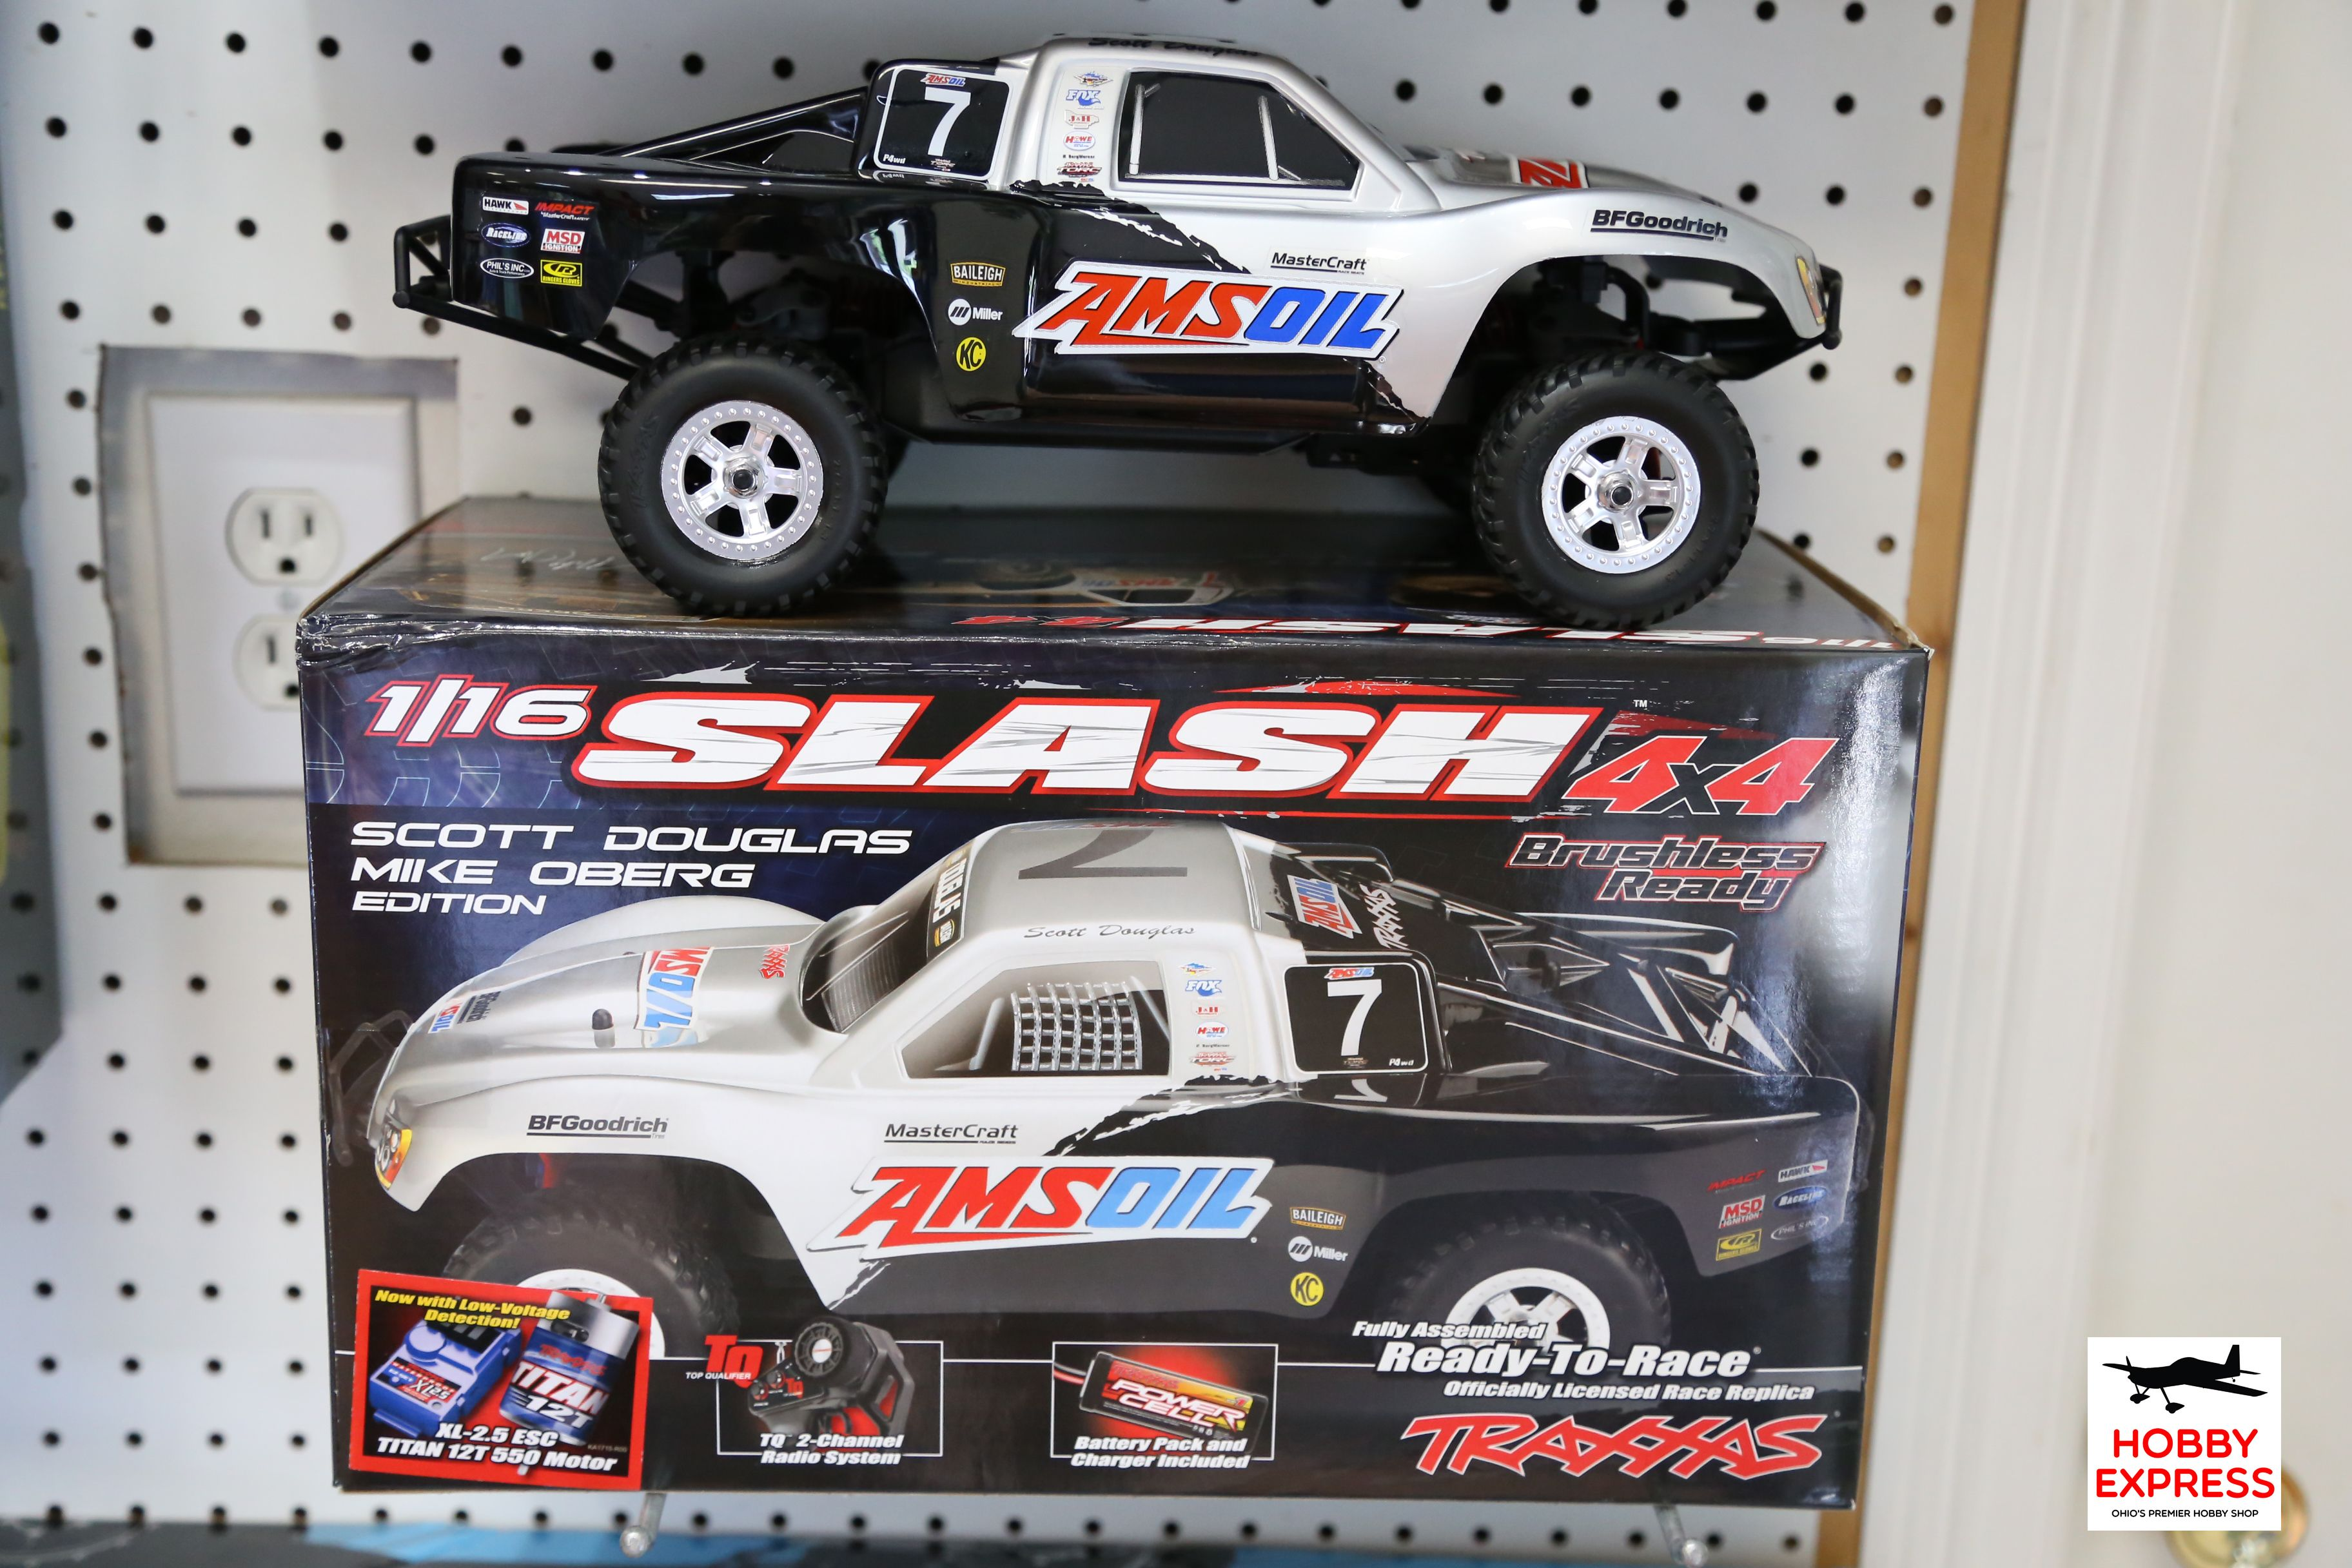 Traxxas Slash 4x4 Scott Douglas Mike Oberg Edition Ready To Race